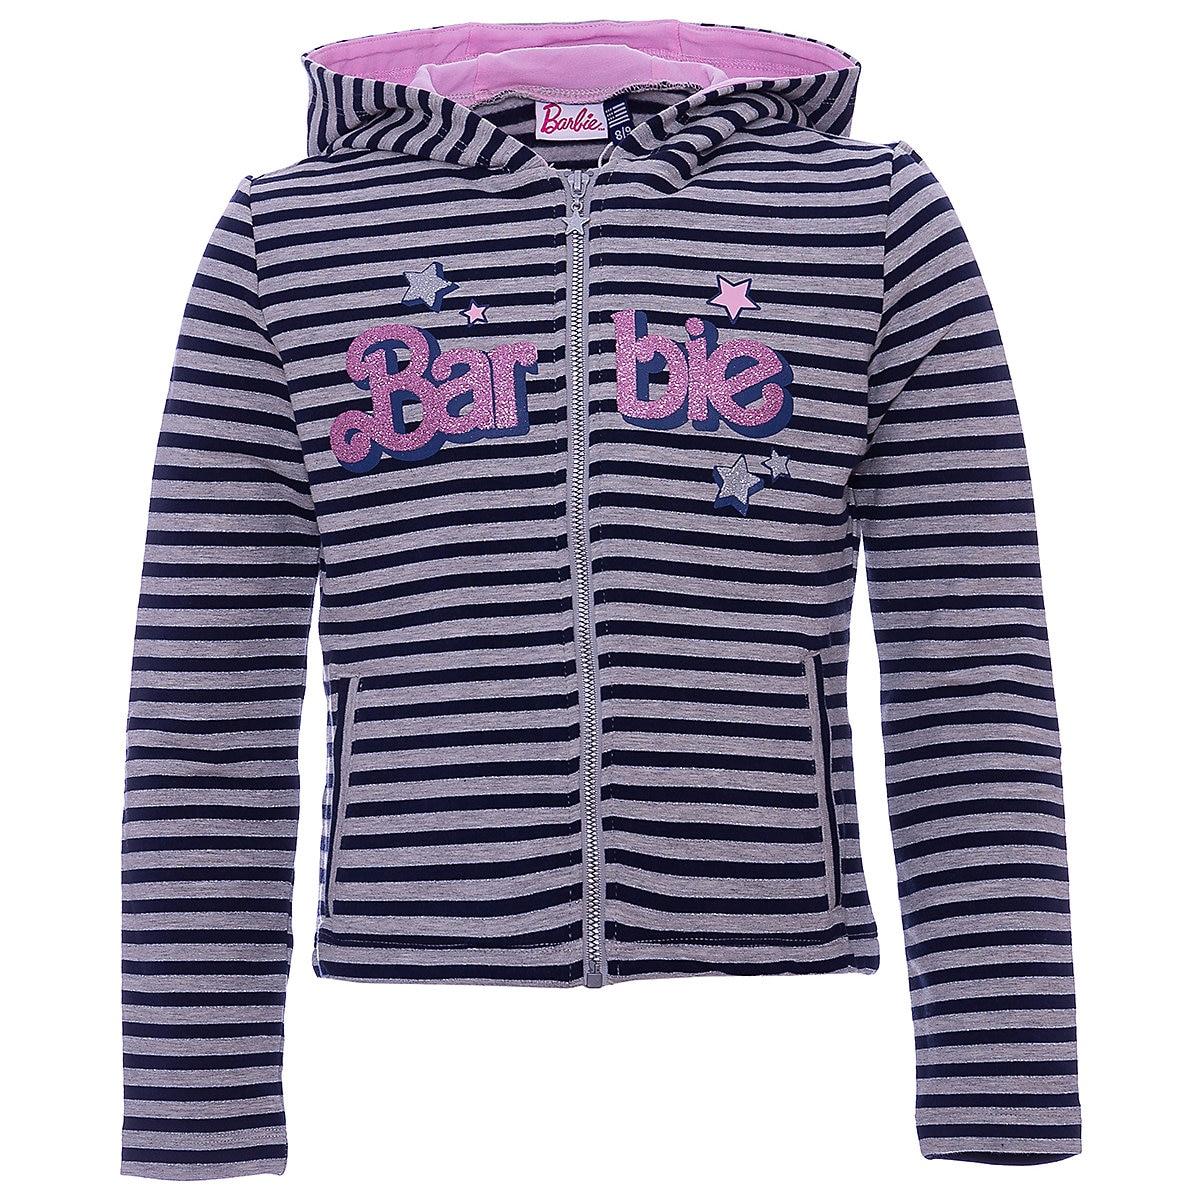 Original Marines Hoodies & Sweatshirts 9501398 Cotton Girls Casual children clothing girl hoodies